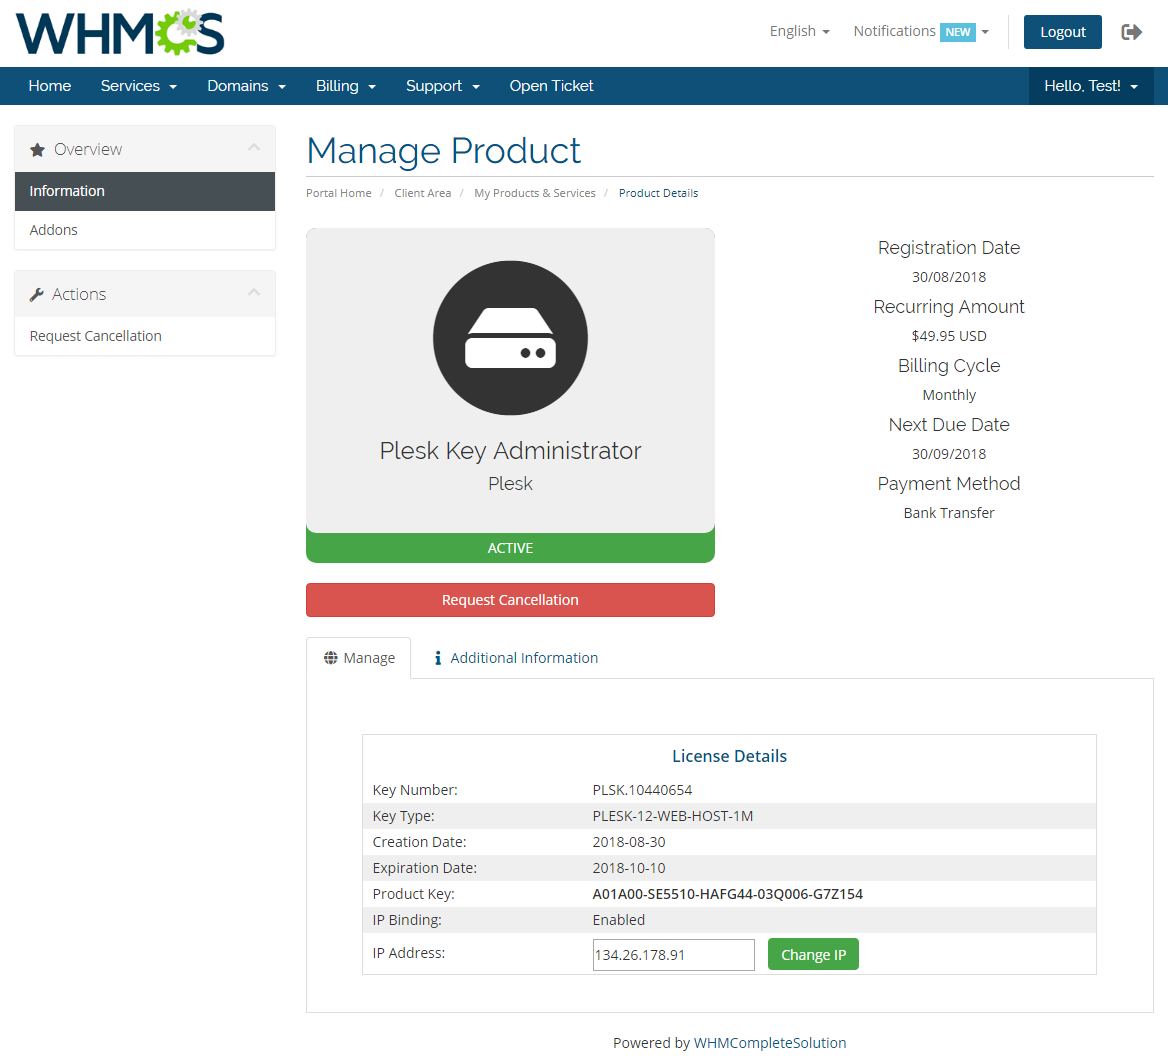 Plesk Key Administrator For WHMCS: Screen 1